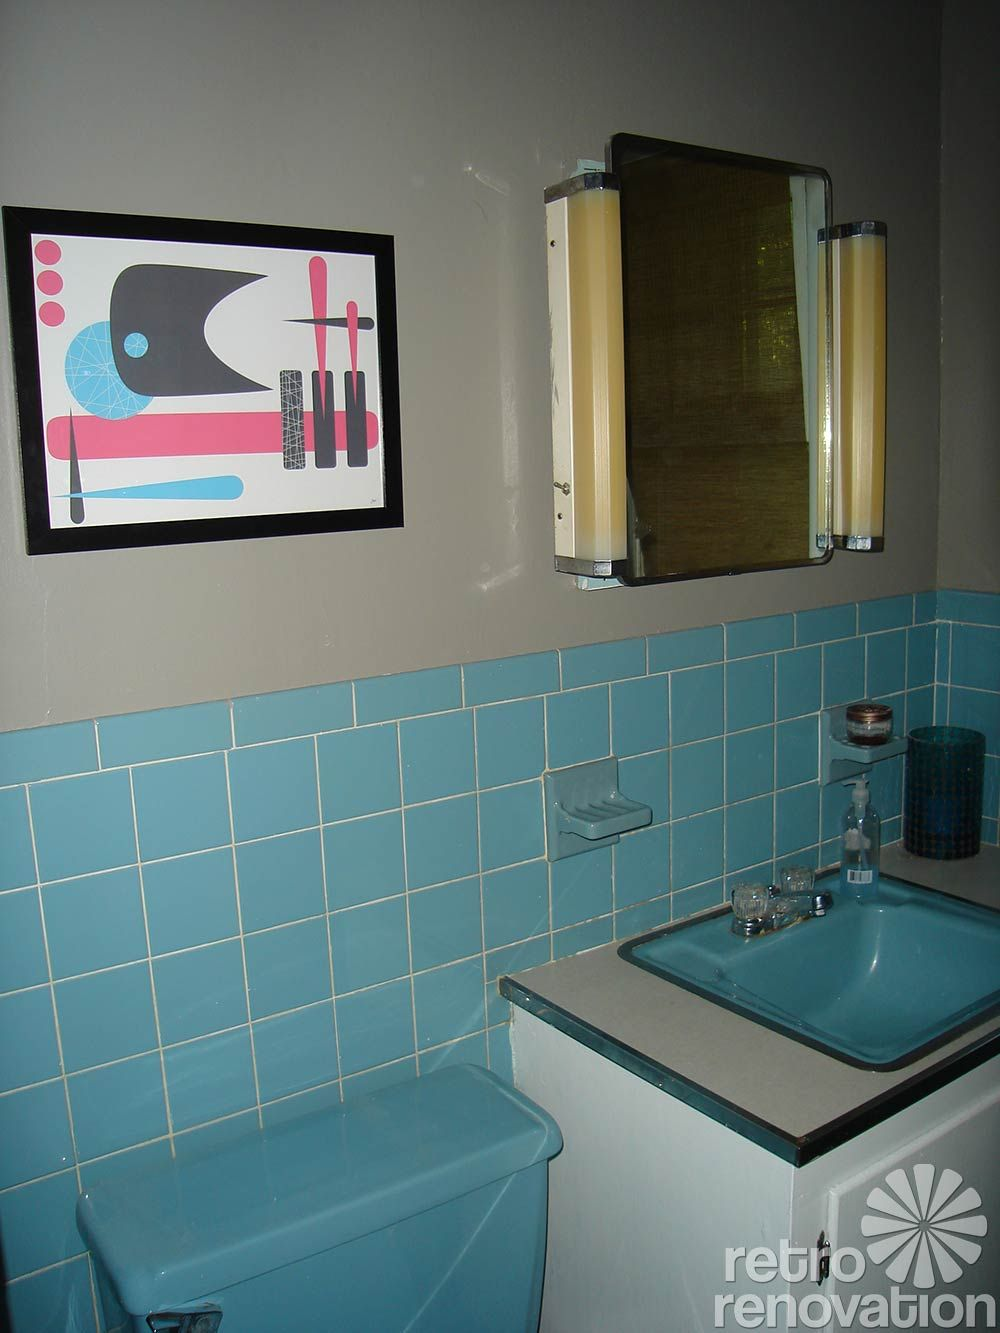 My Parents Had A Blue Tile Bathroom Blue Sink Tub Toilet Blue Bathroom Tile Light Blue Bathroom Retro Bathrooms